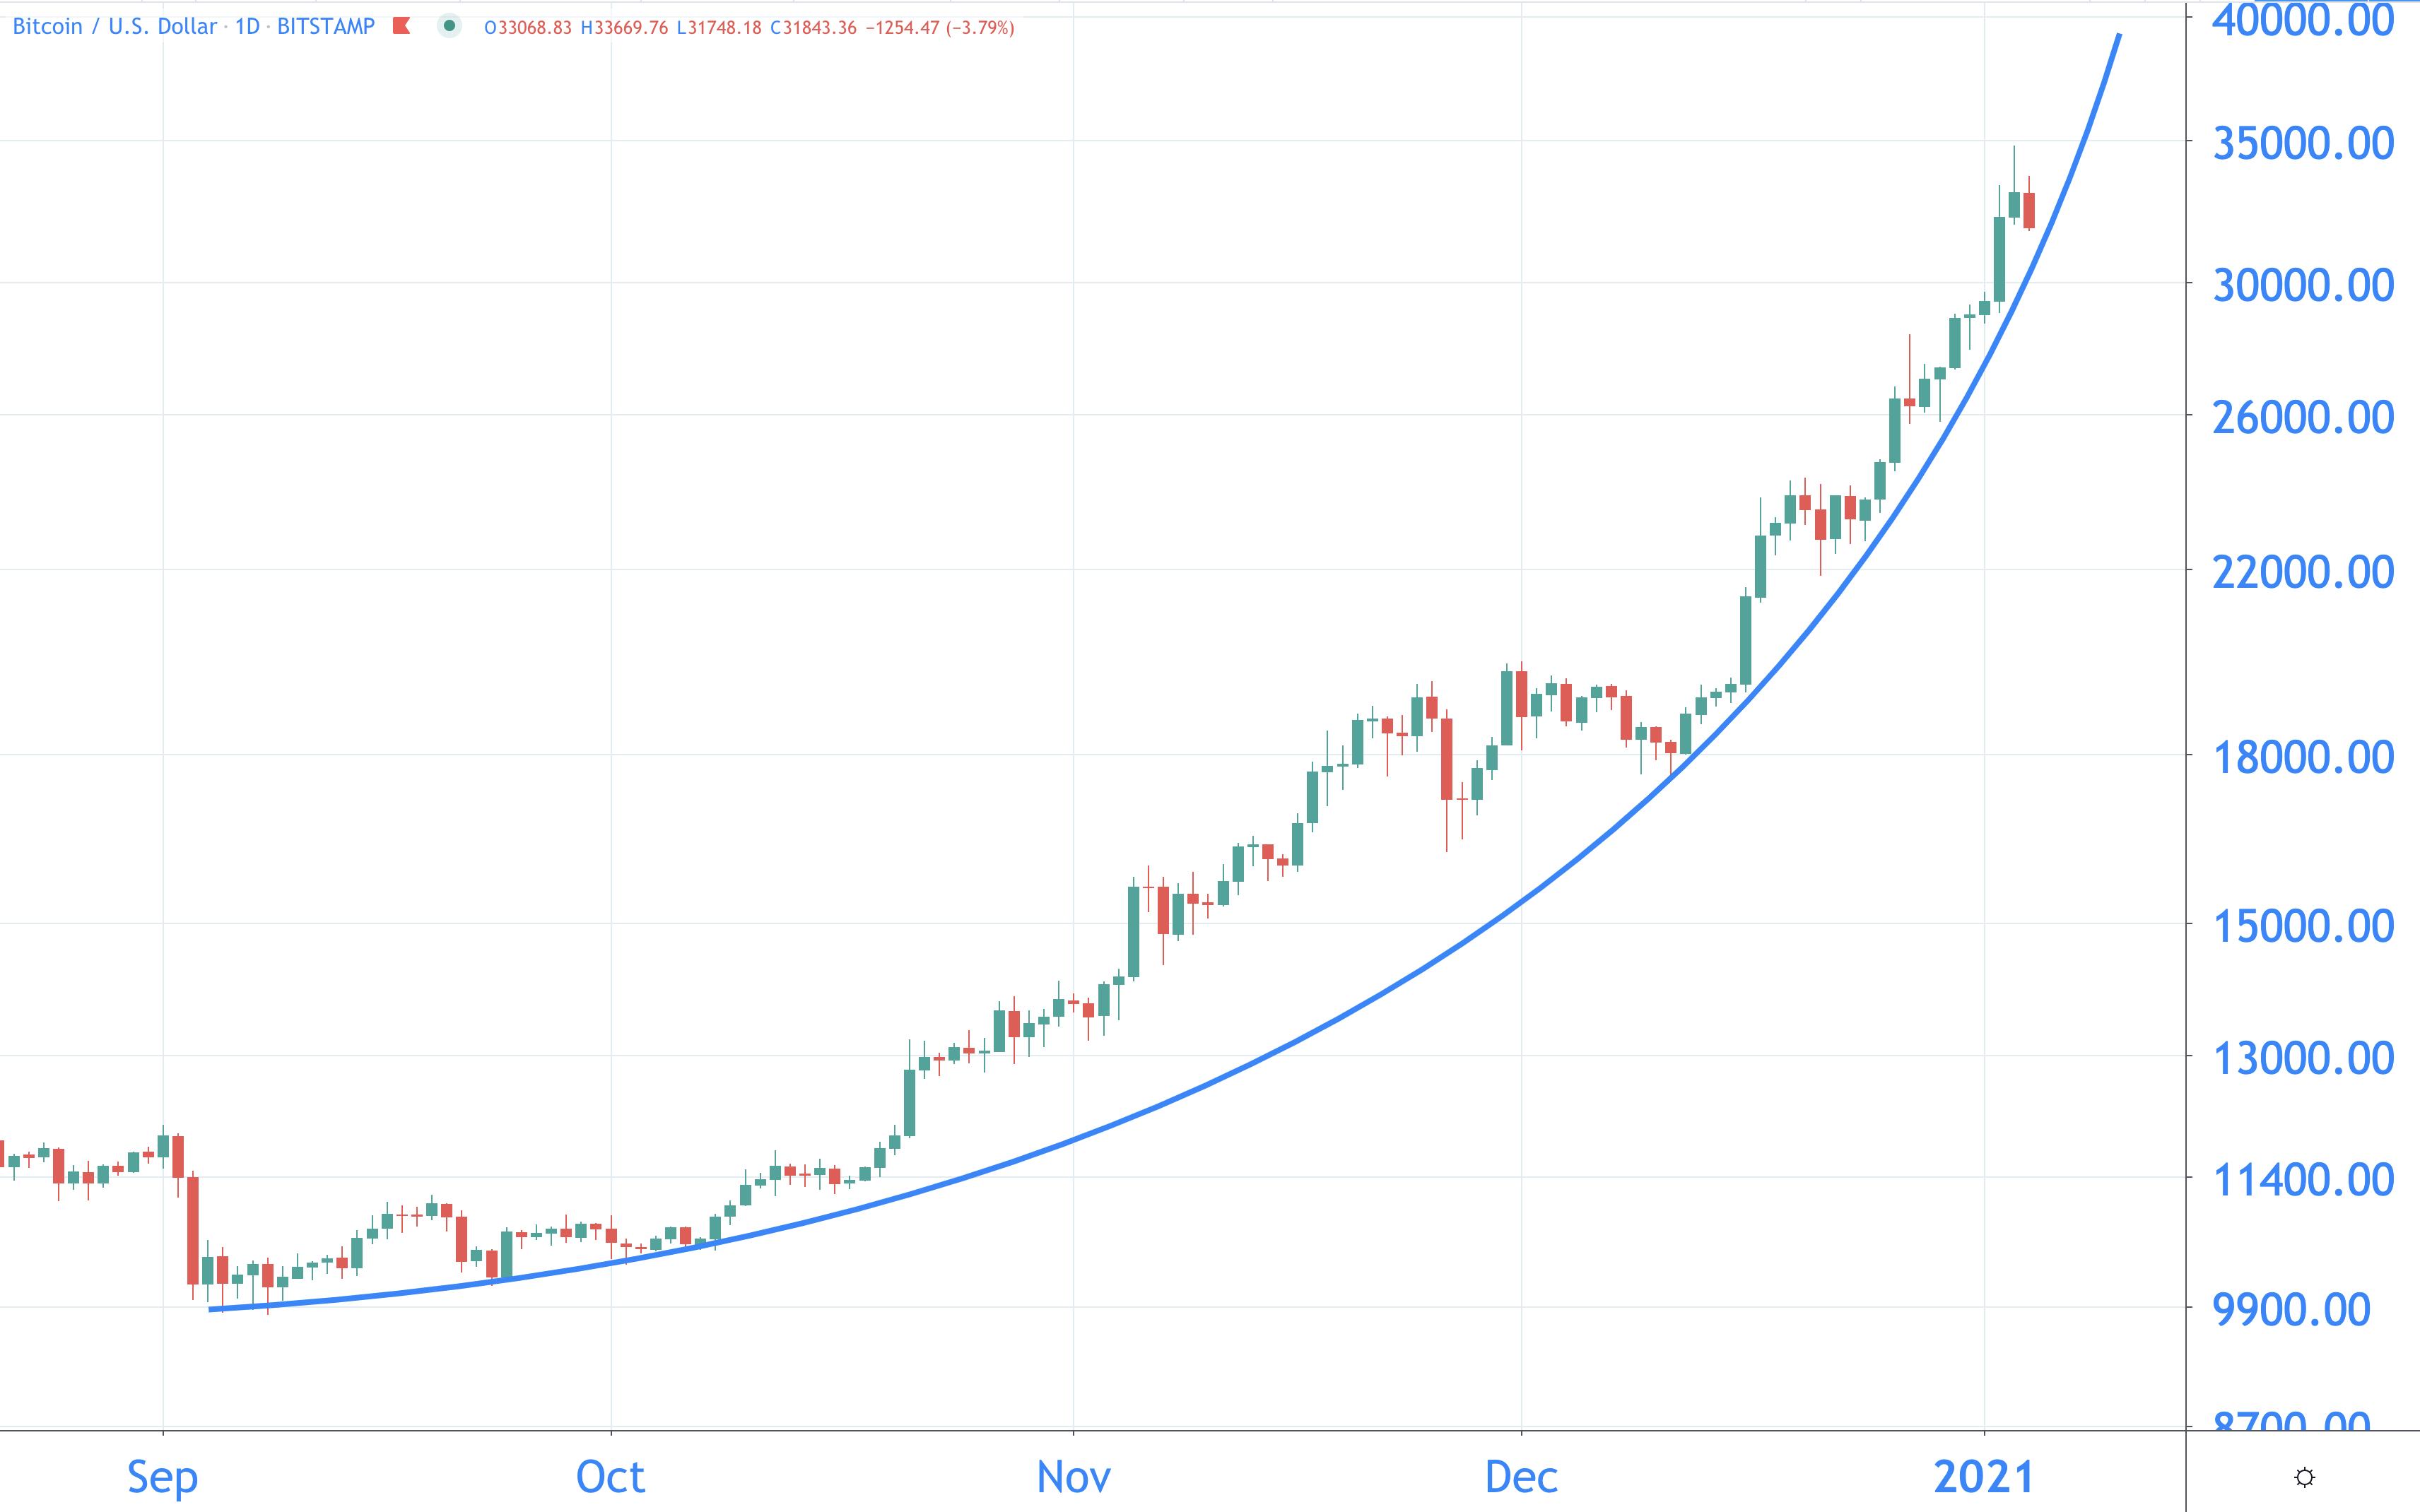 koers btc qt bitcoin trader alternatyvi